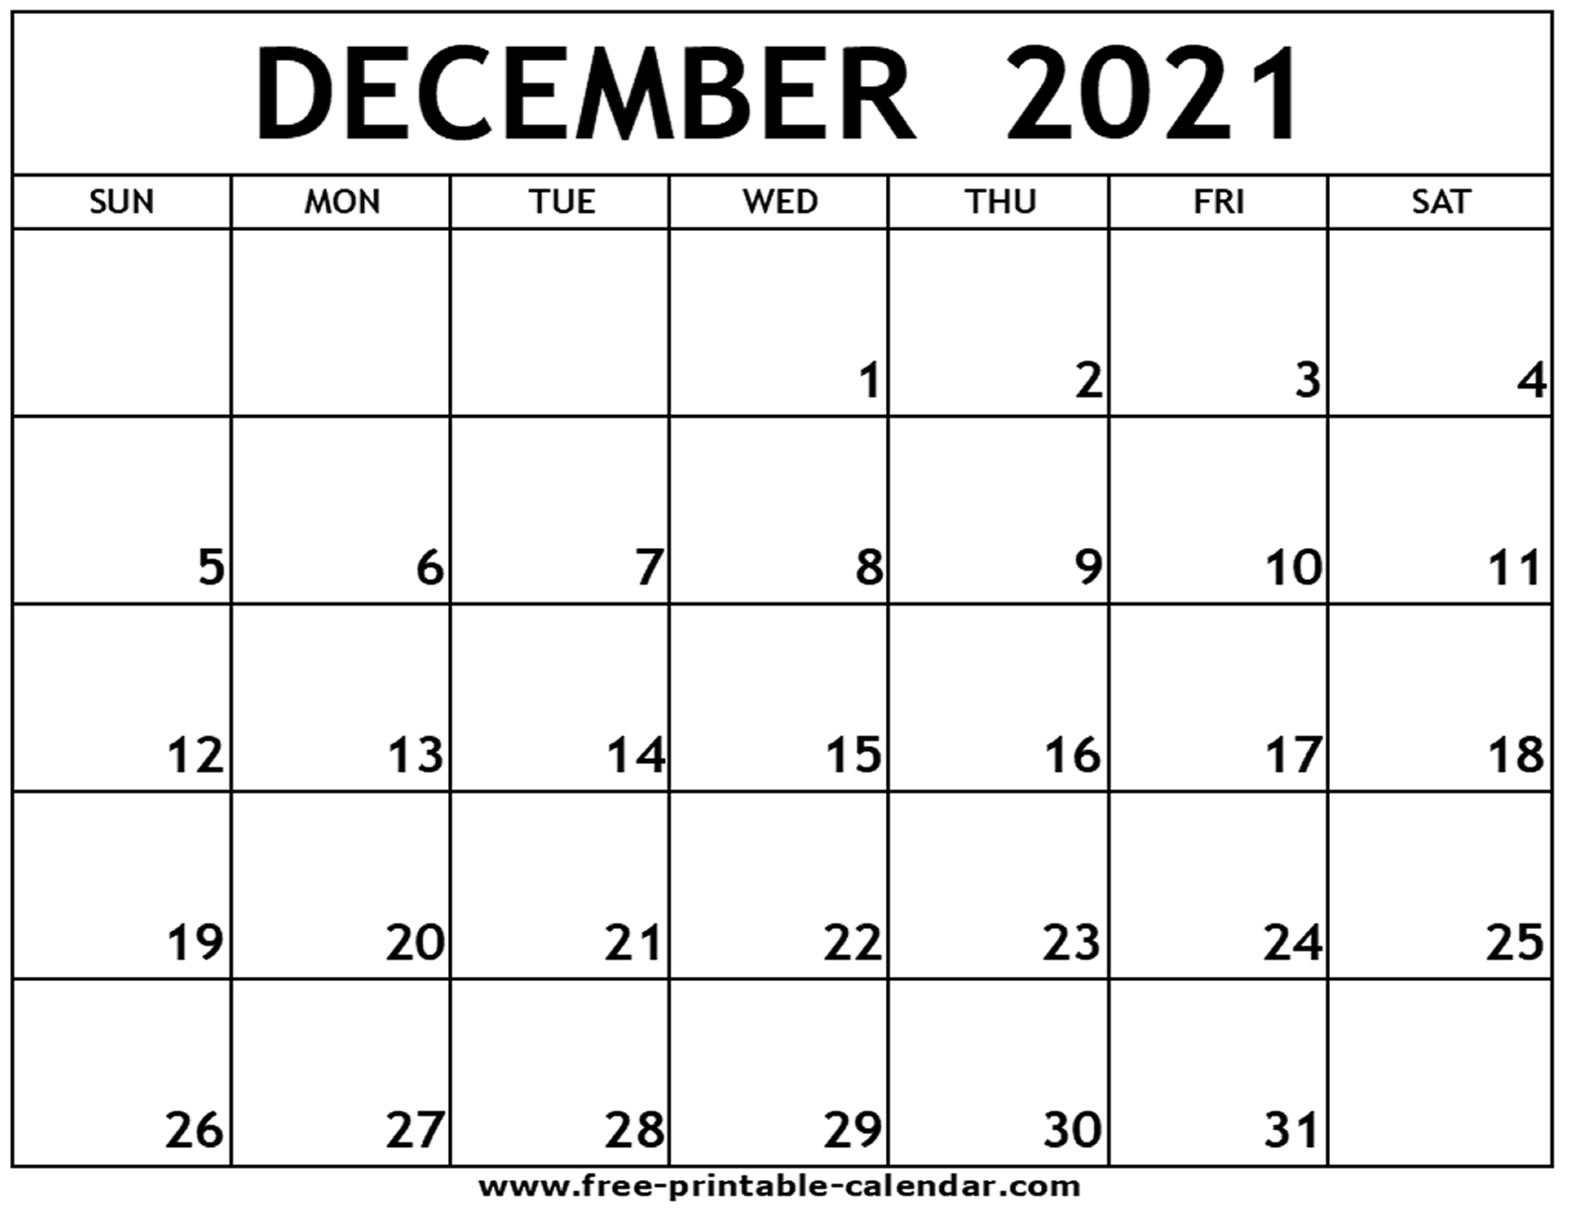 Catch 2021 Free Printable Calendar August Through Decemeber